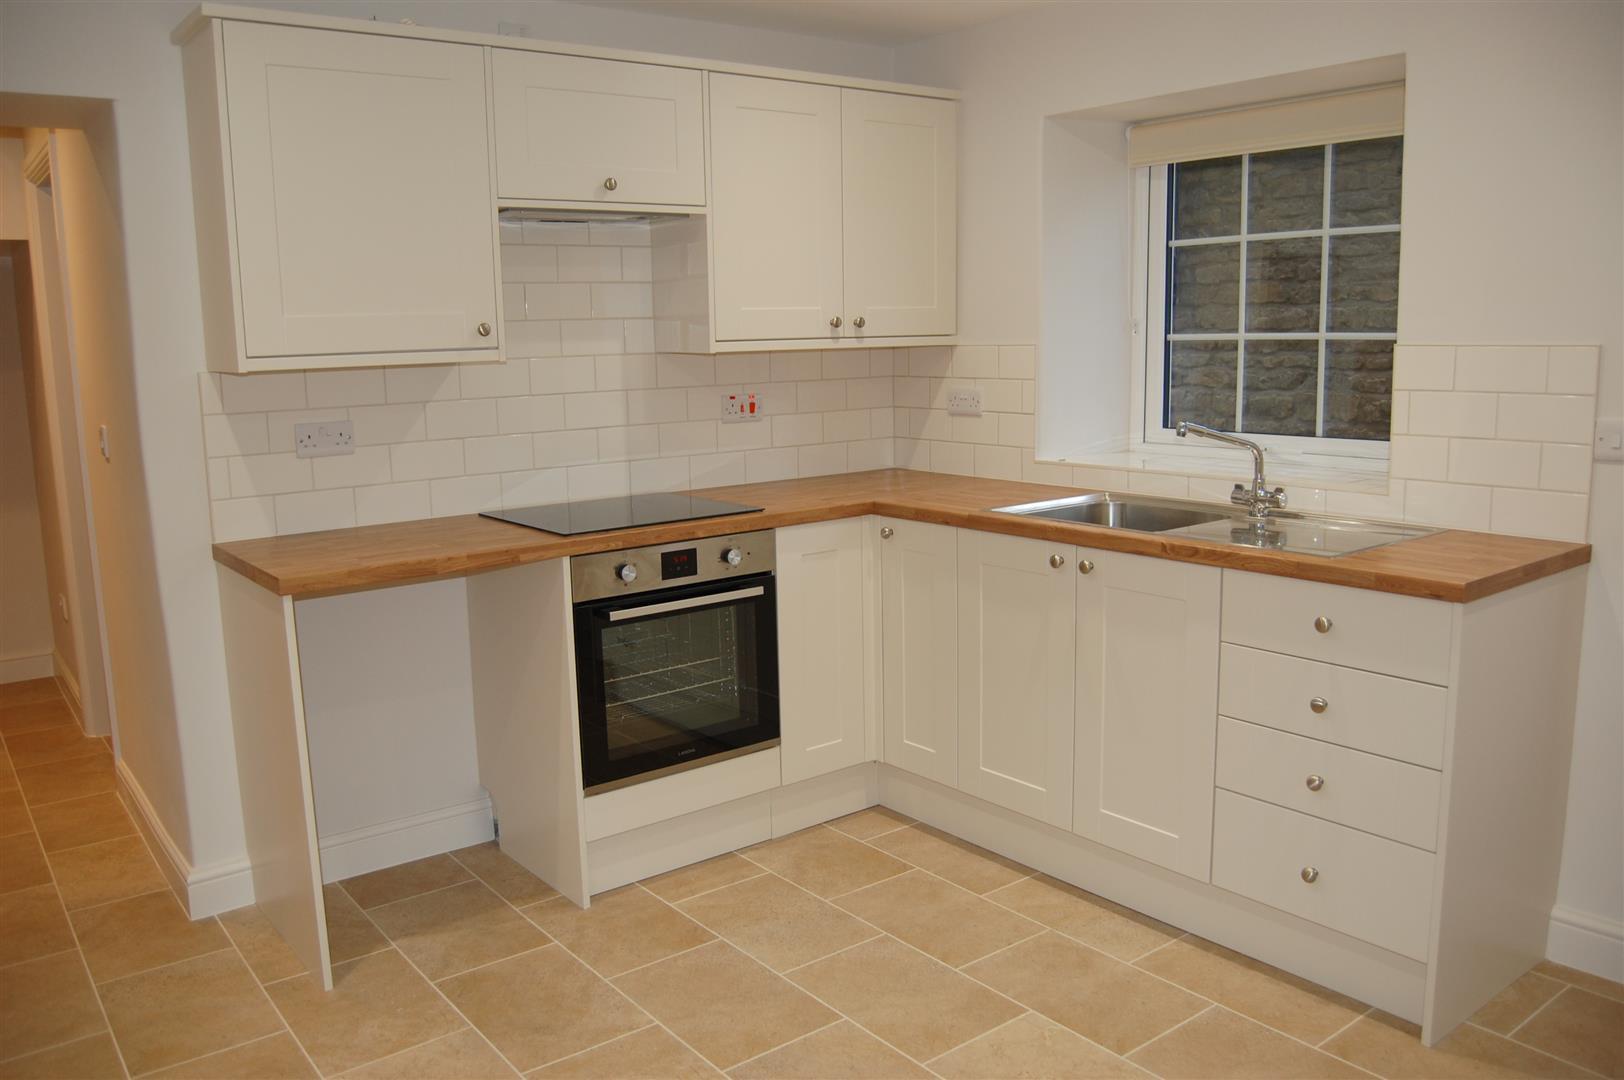 2 bedroom property in Grantham